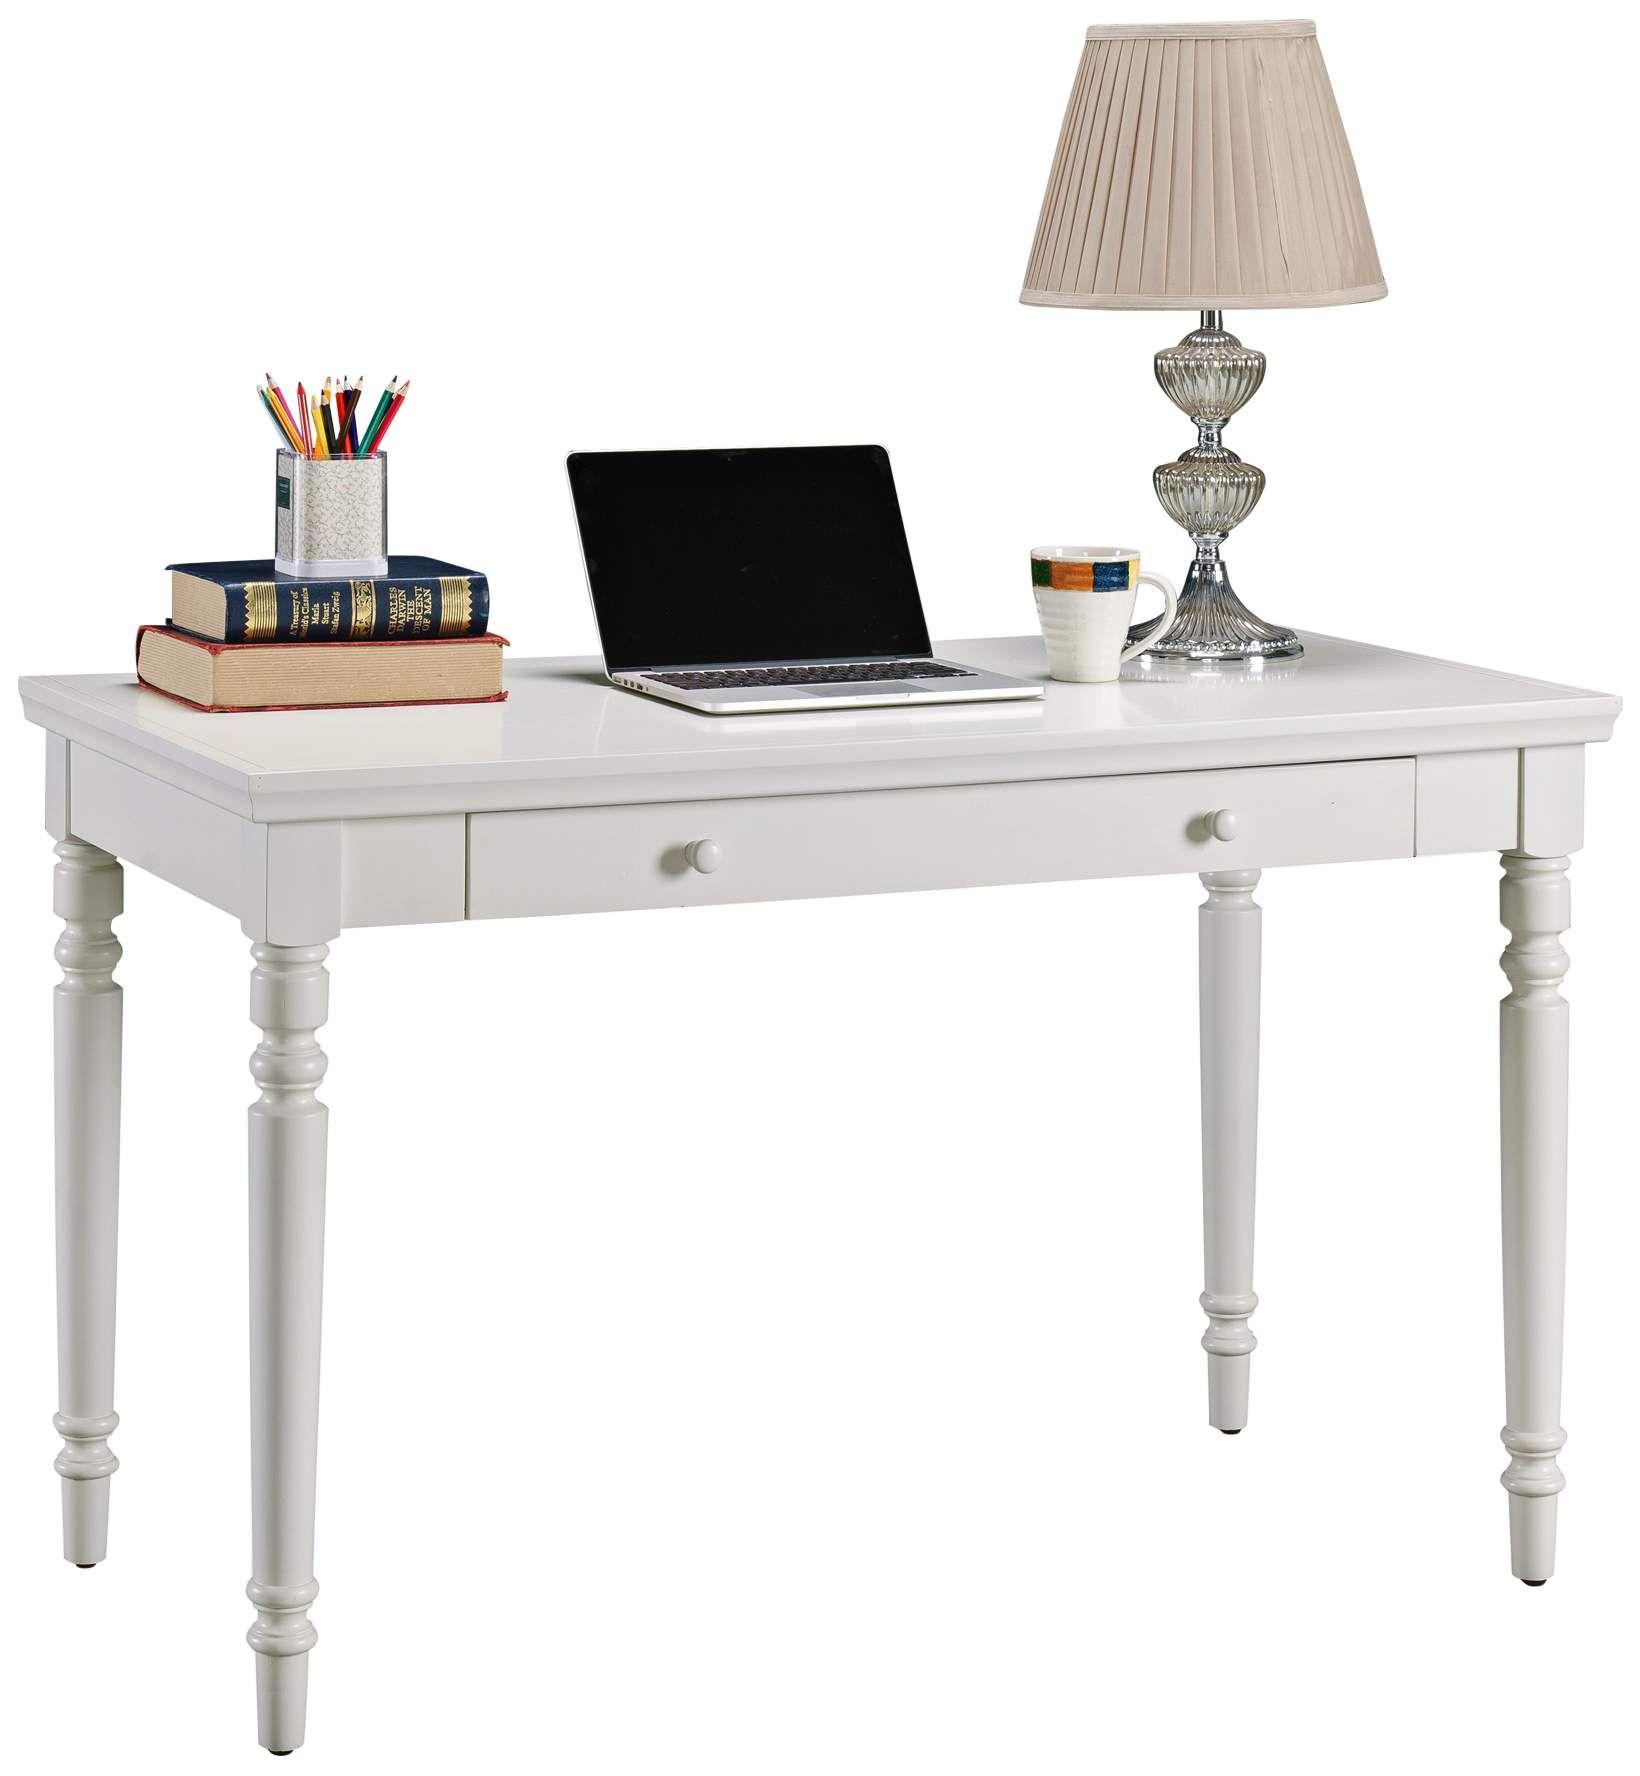 Leick 48 Inch Wide Farmhouse White 1 Drawer Wood Laptop Desk